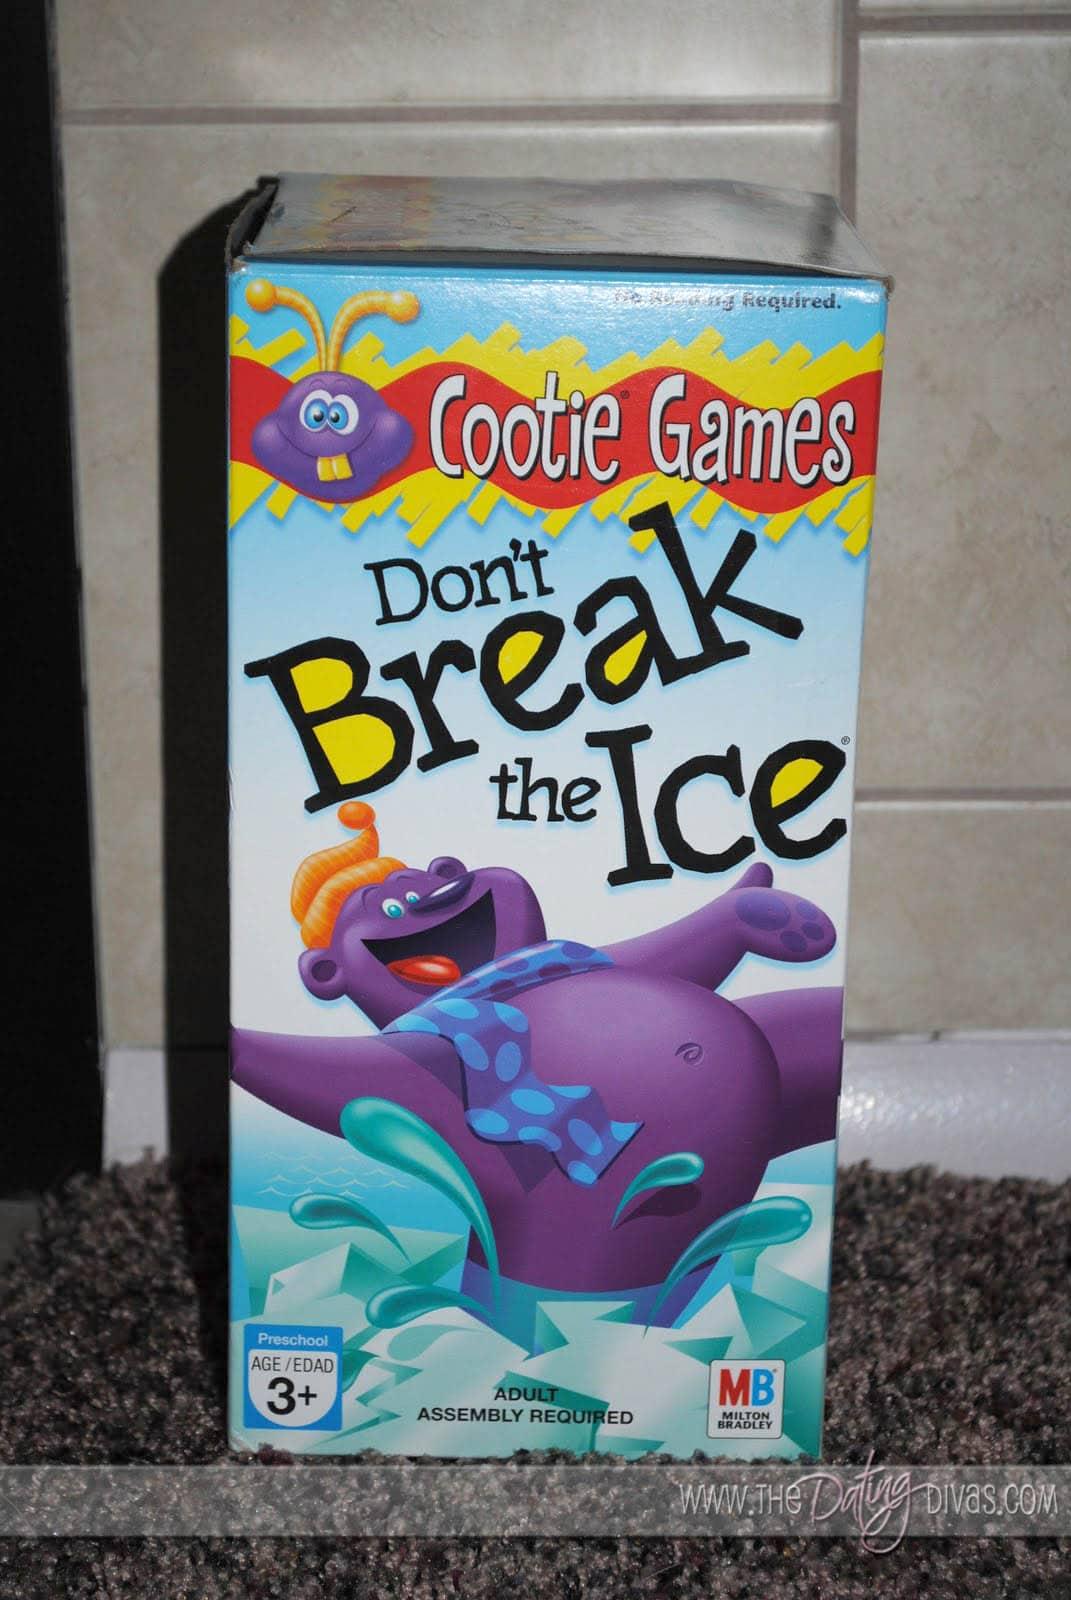 Speed hookup as an icebreaker activity